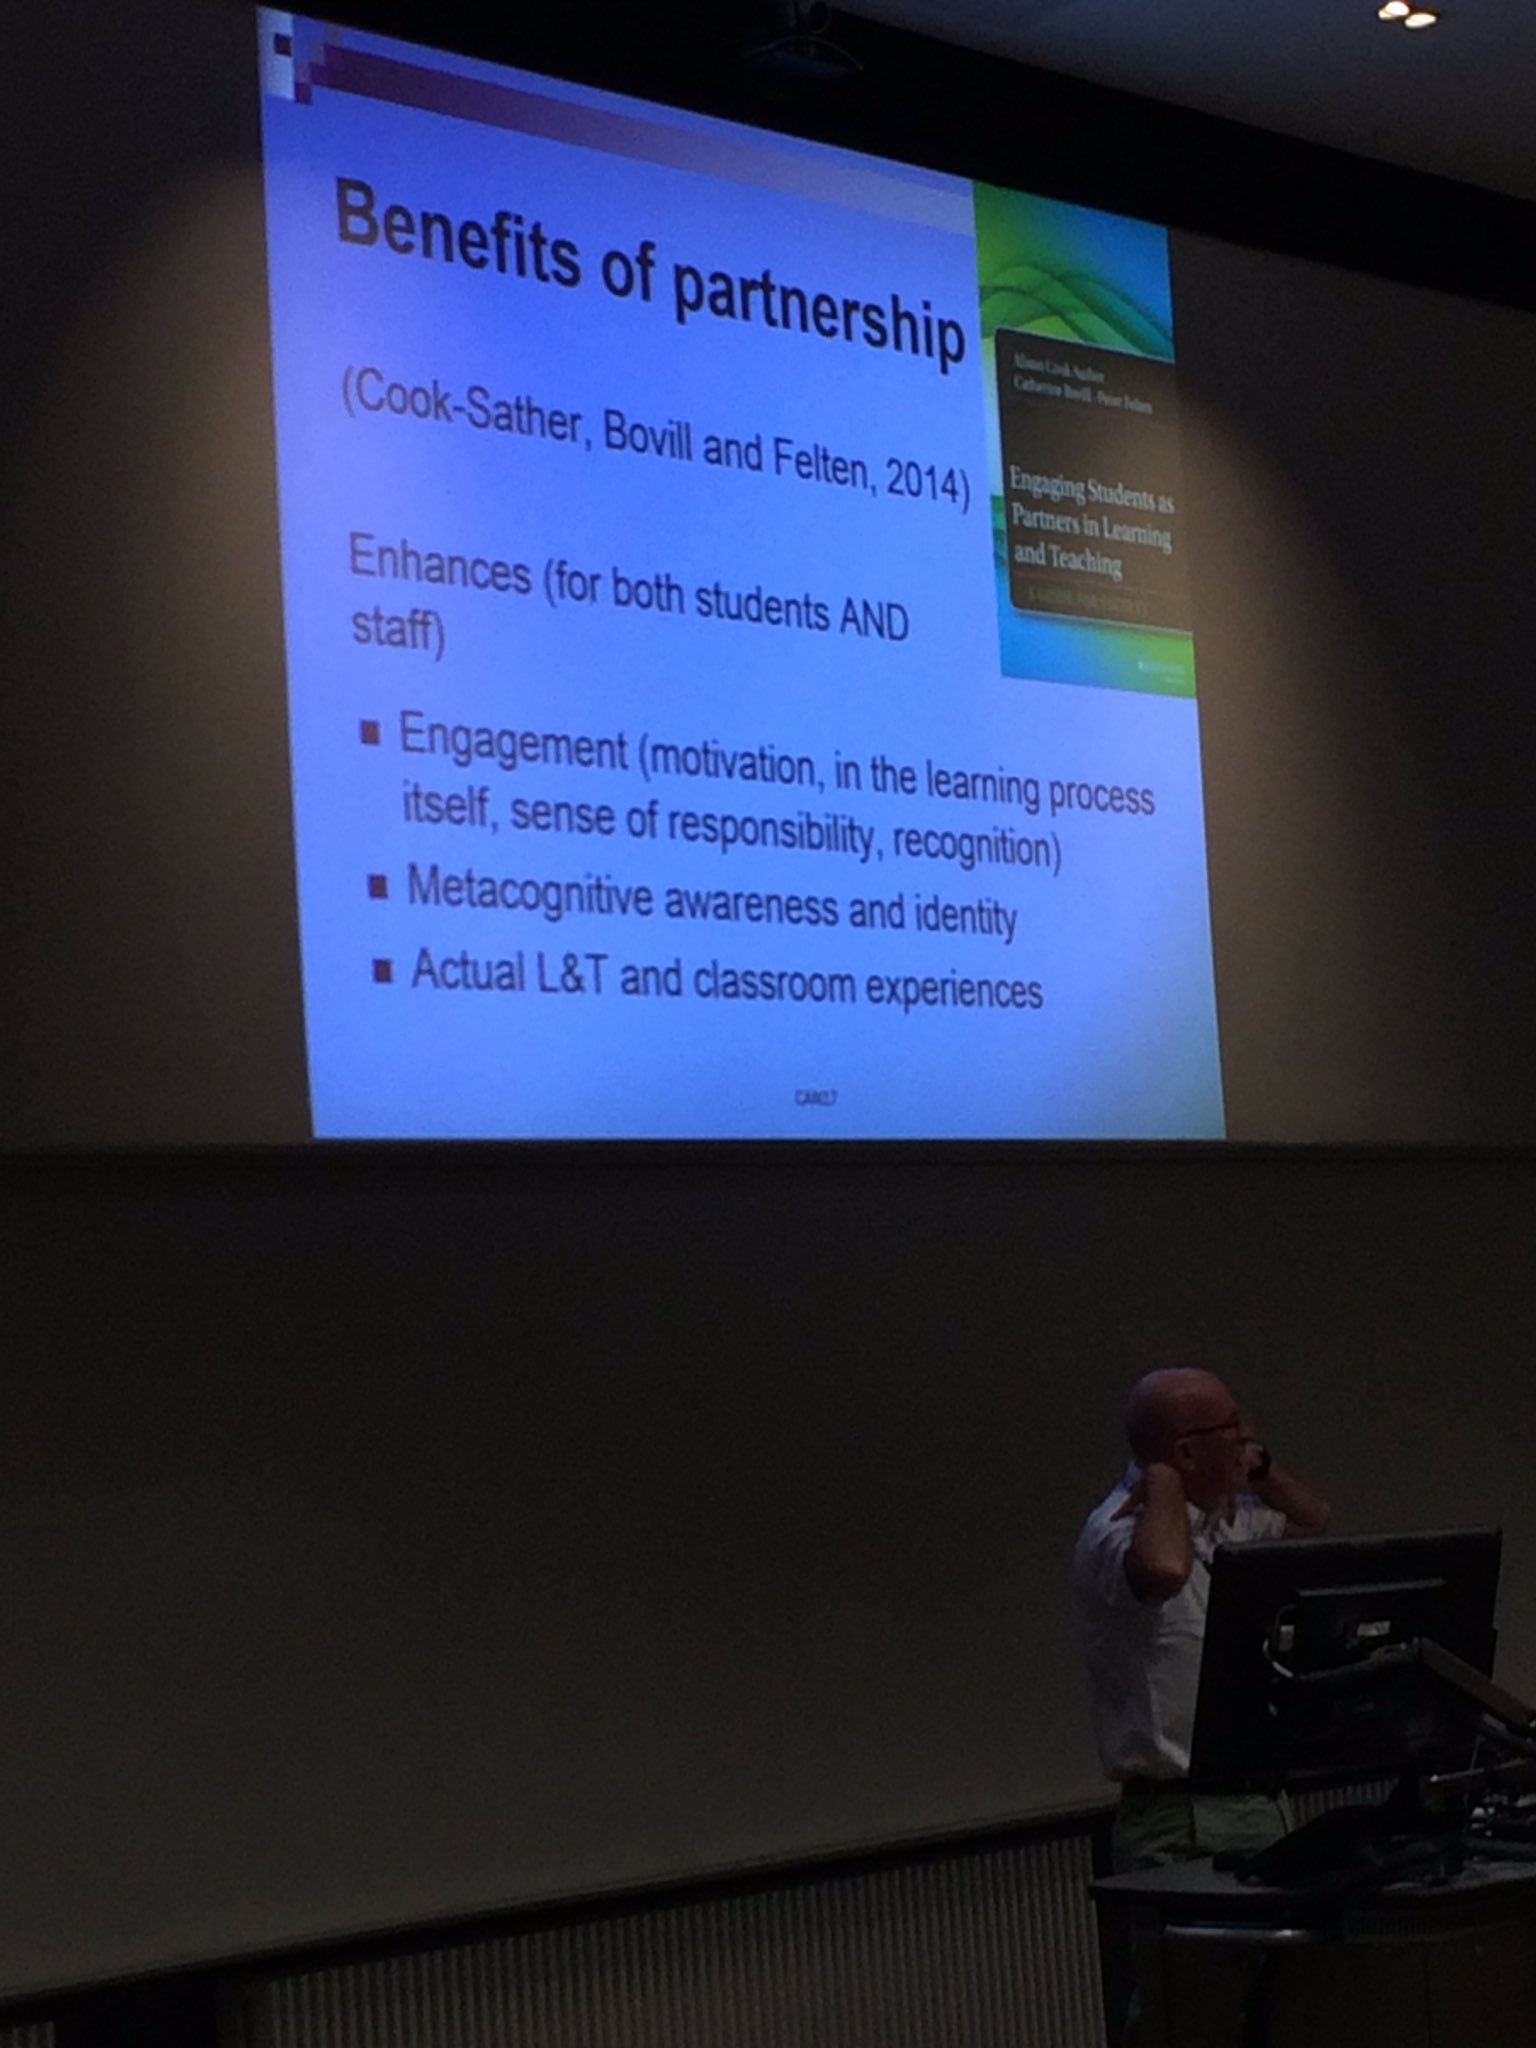 Colin Bryson sharing the benefits of partnership #JiscCAN17 https://t.co/RJmilTT6oY